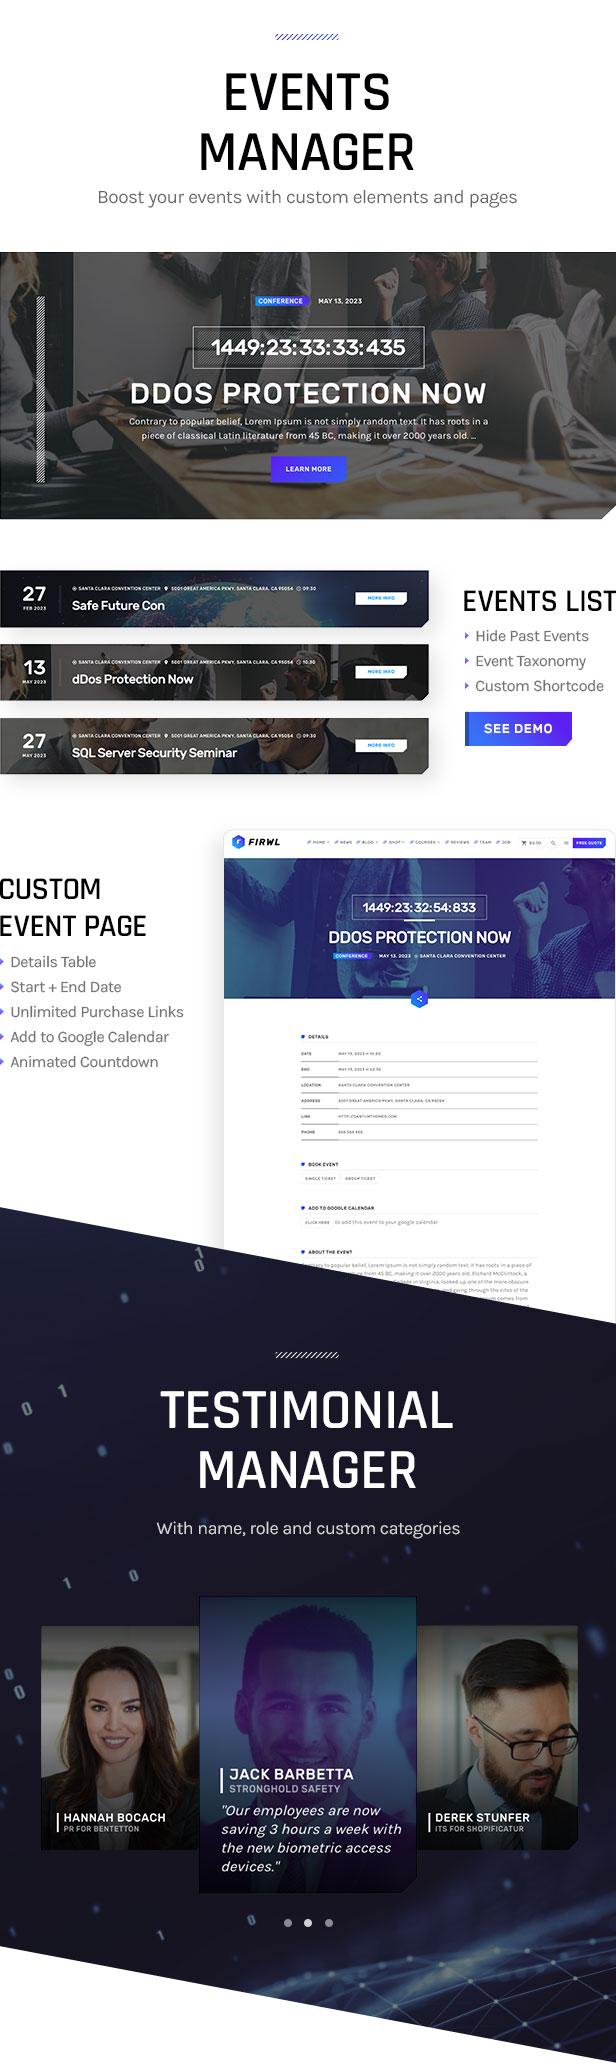 Firwl - Cyber Security WordPress Theme - 12